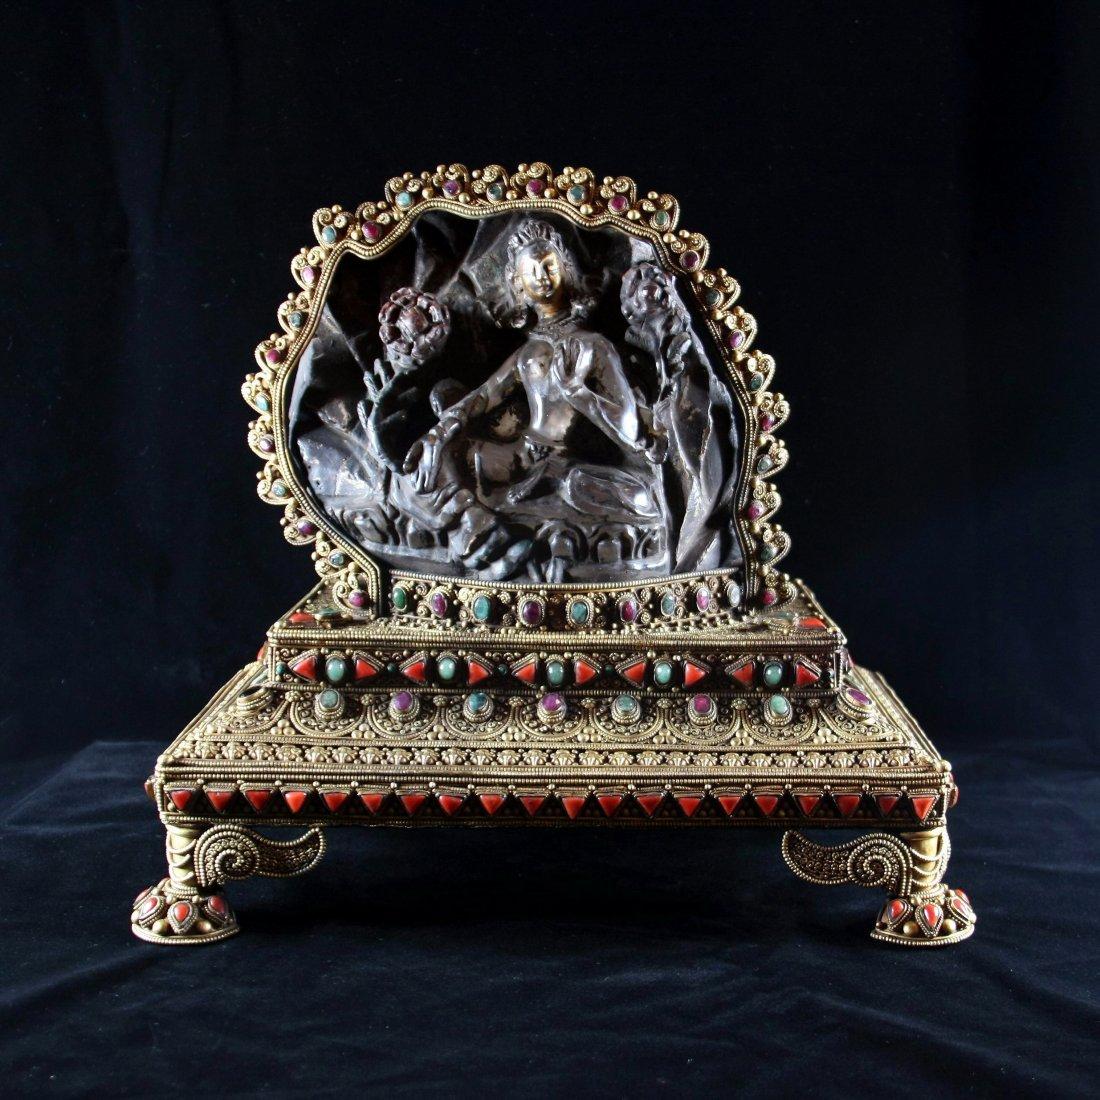 Tang Dynasty Rock Crystal Carving of Tara Bodhisattva